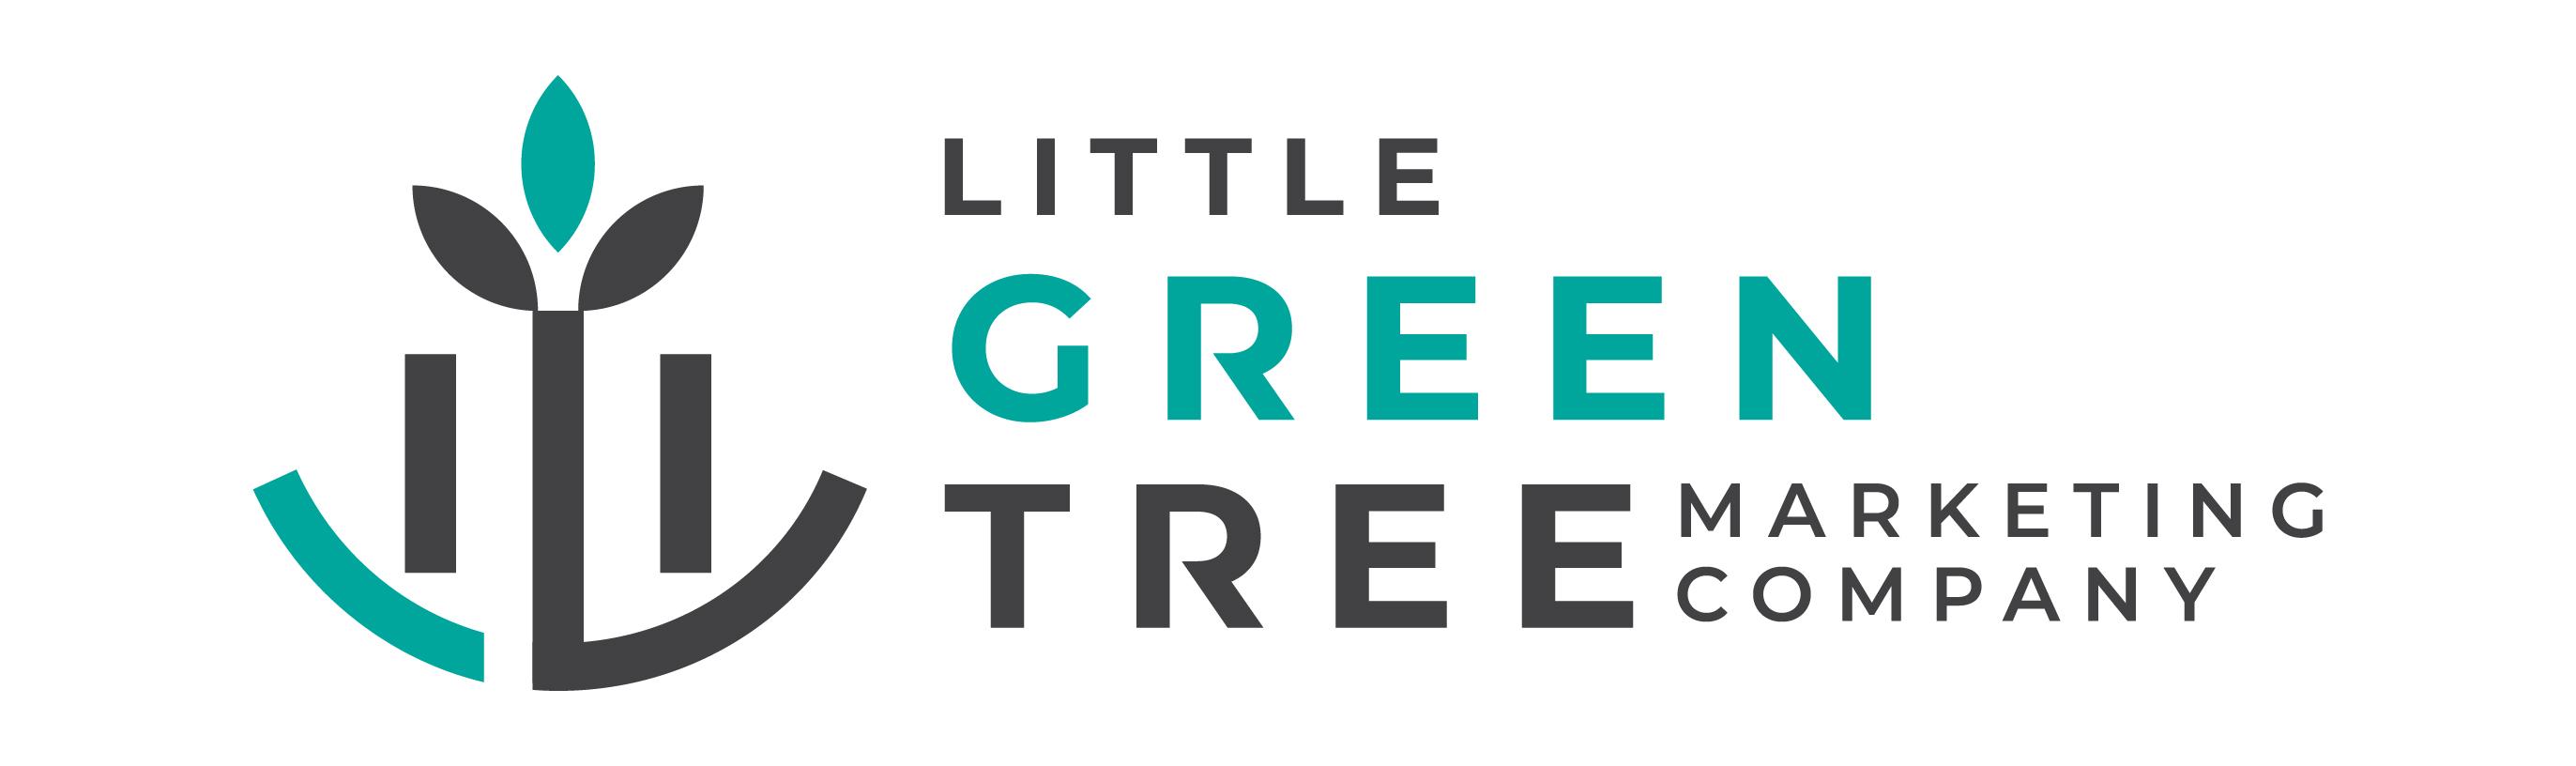 Logo of LITTLE GREEN TREE MARKETING LIMITED